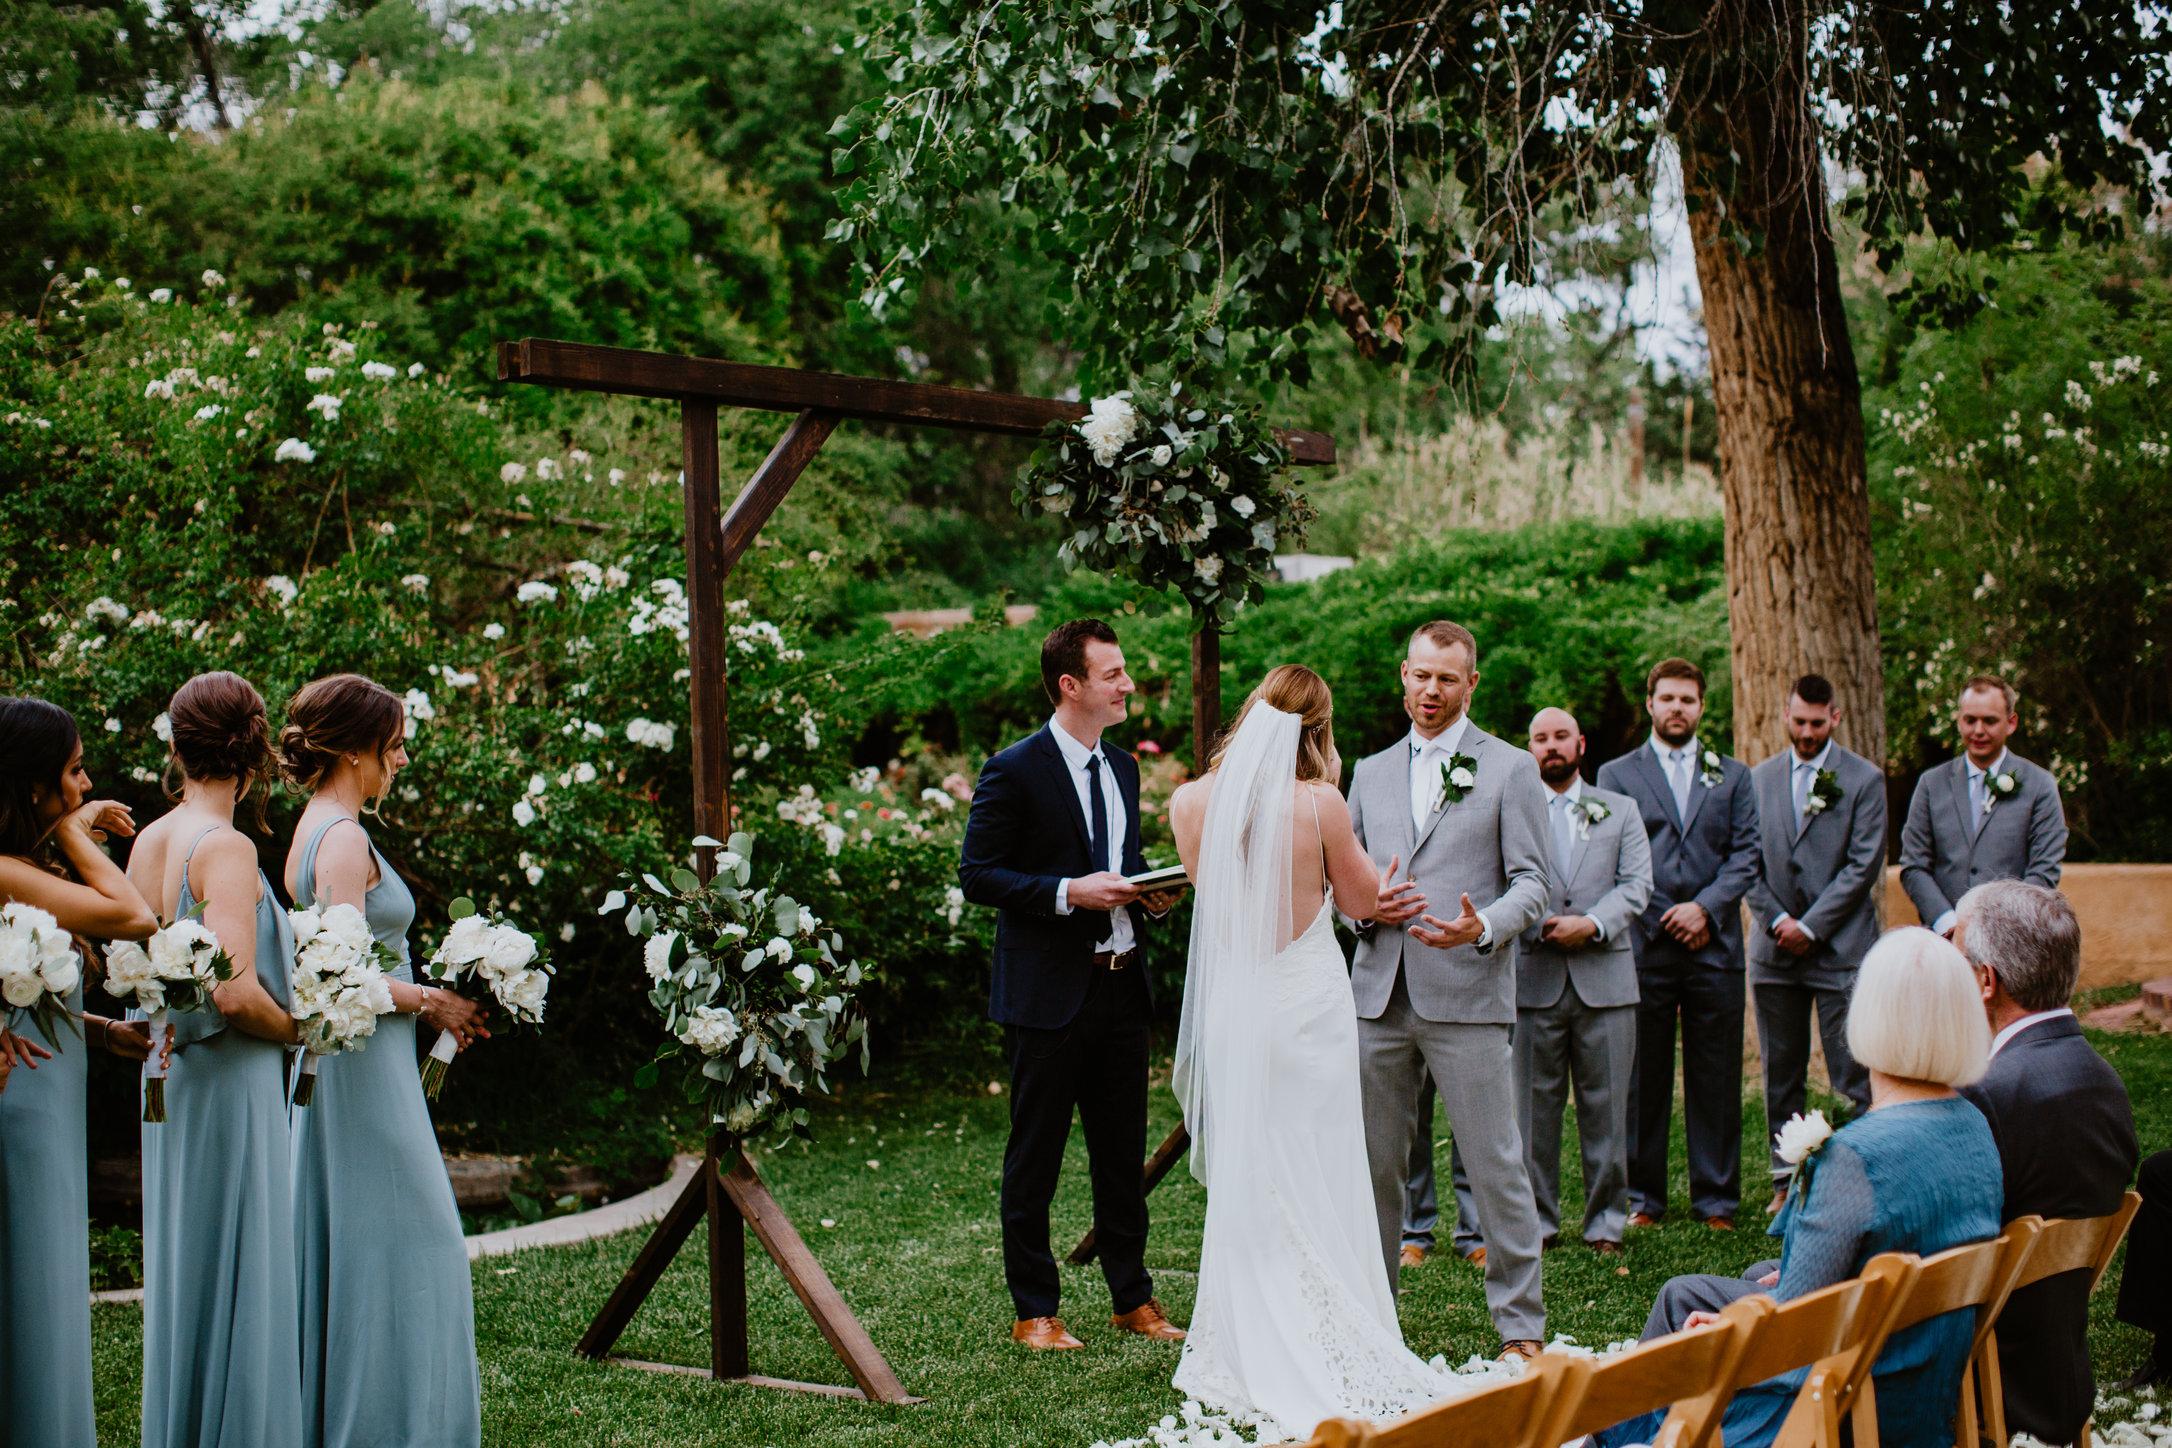 DandA-wedding-287.jpg